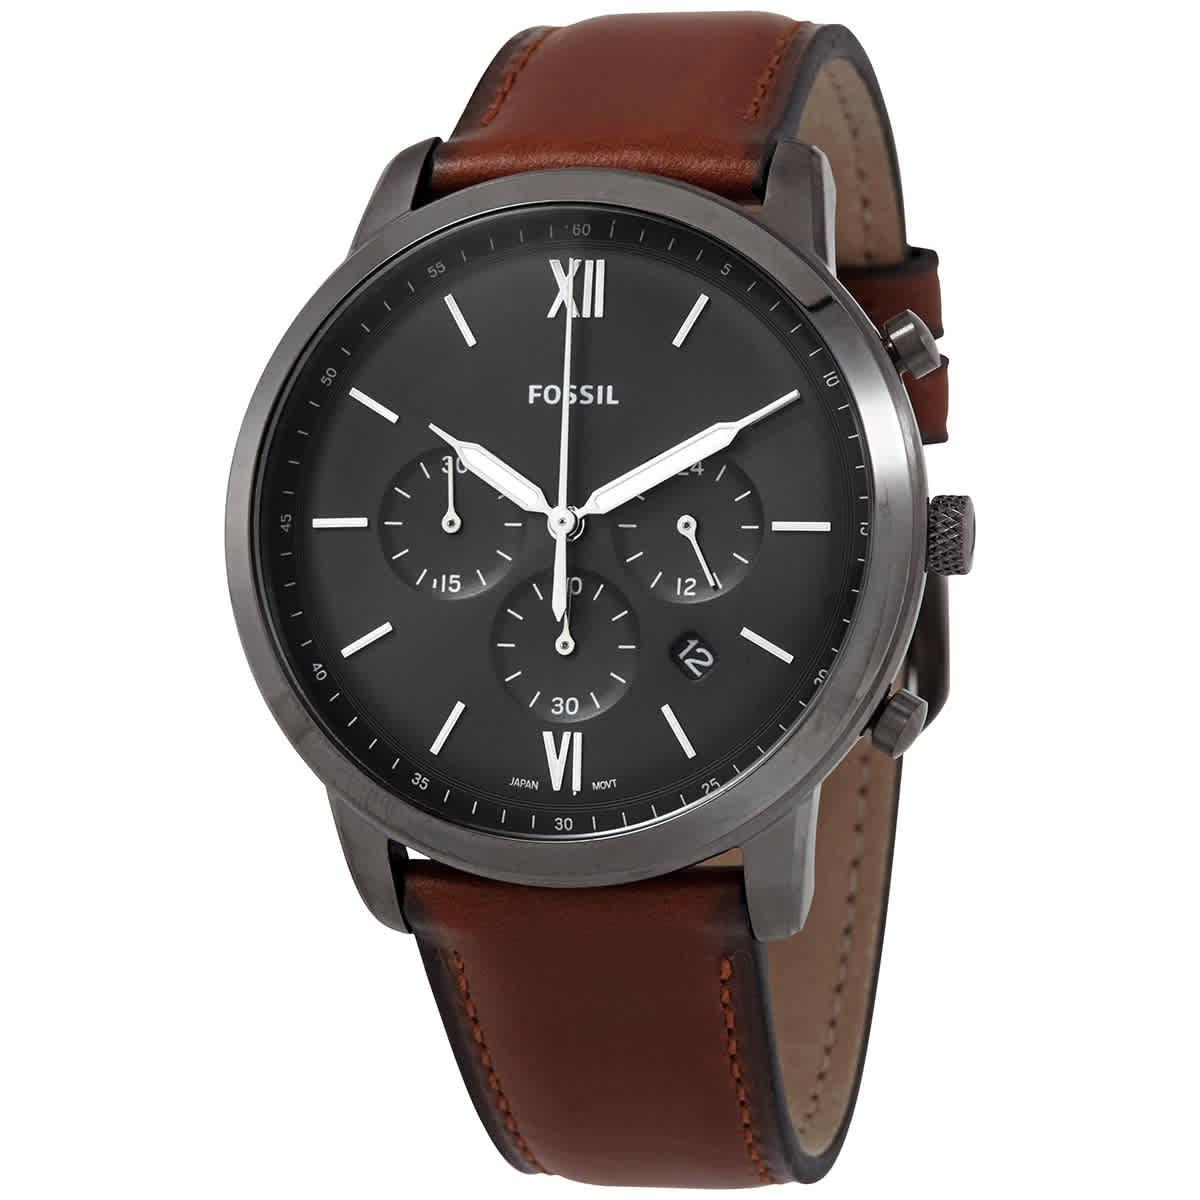 Fossil Neutra Chronograph Quartz Black Dial Mens Watch Fs5512 In Black,gunmetal,orange,silver Tone